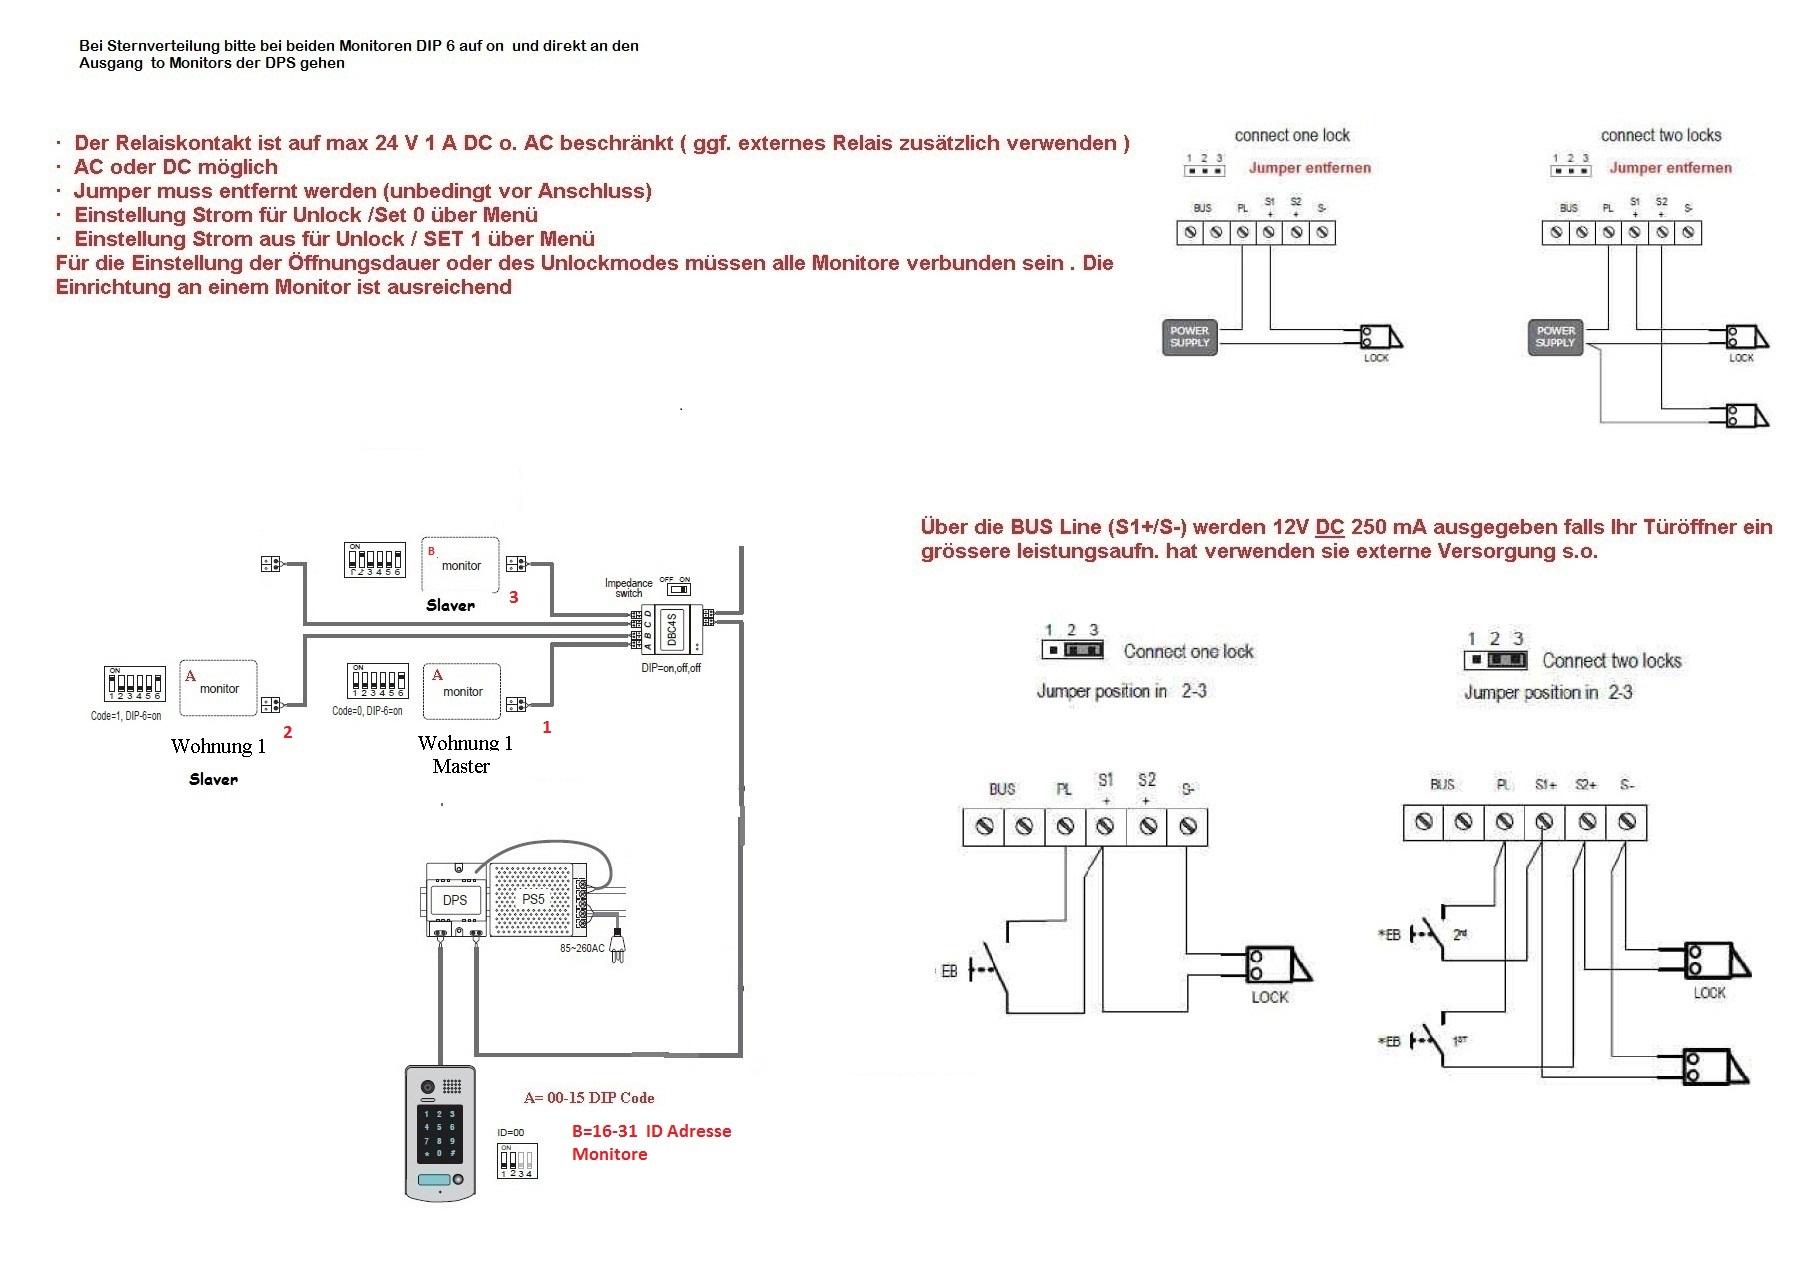 gegensprechanlage anschlie en 2 draht technik elektrik heimwerken haustechnik. Black Bedroom Furniture Sets. Home Design Ideas